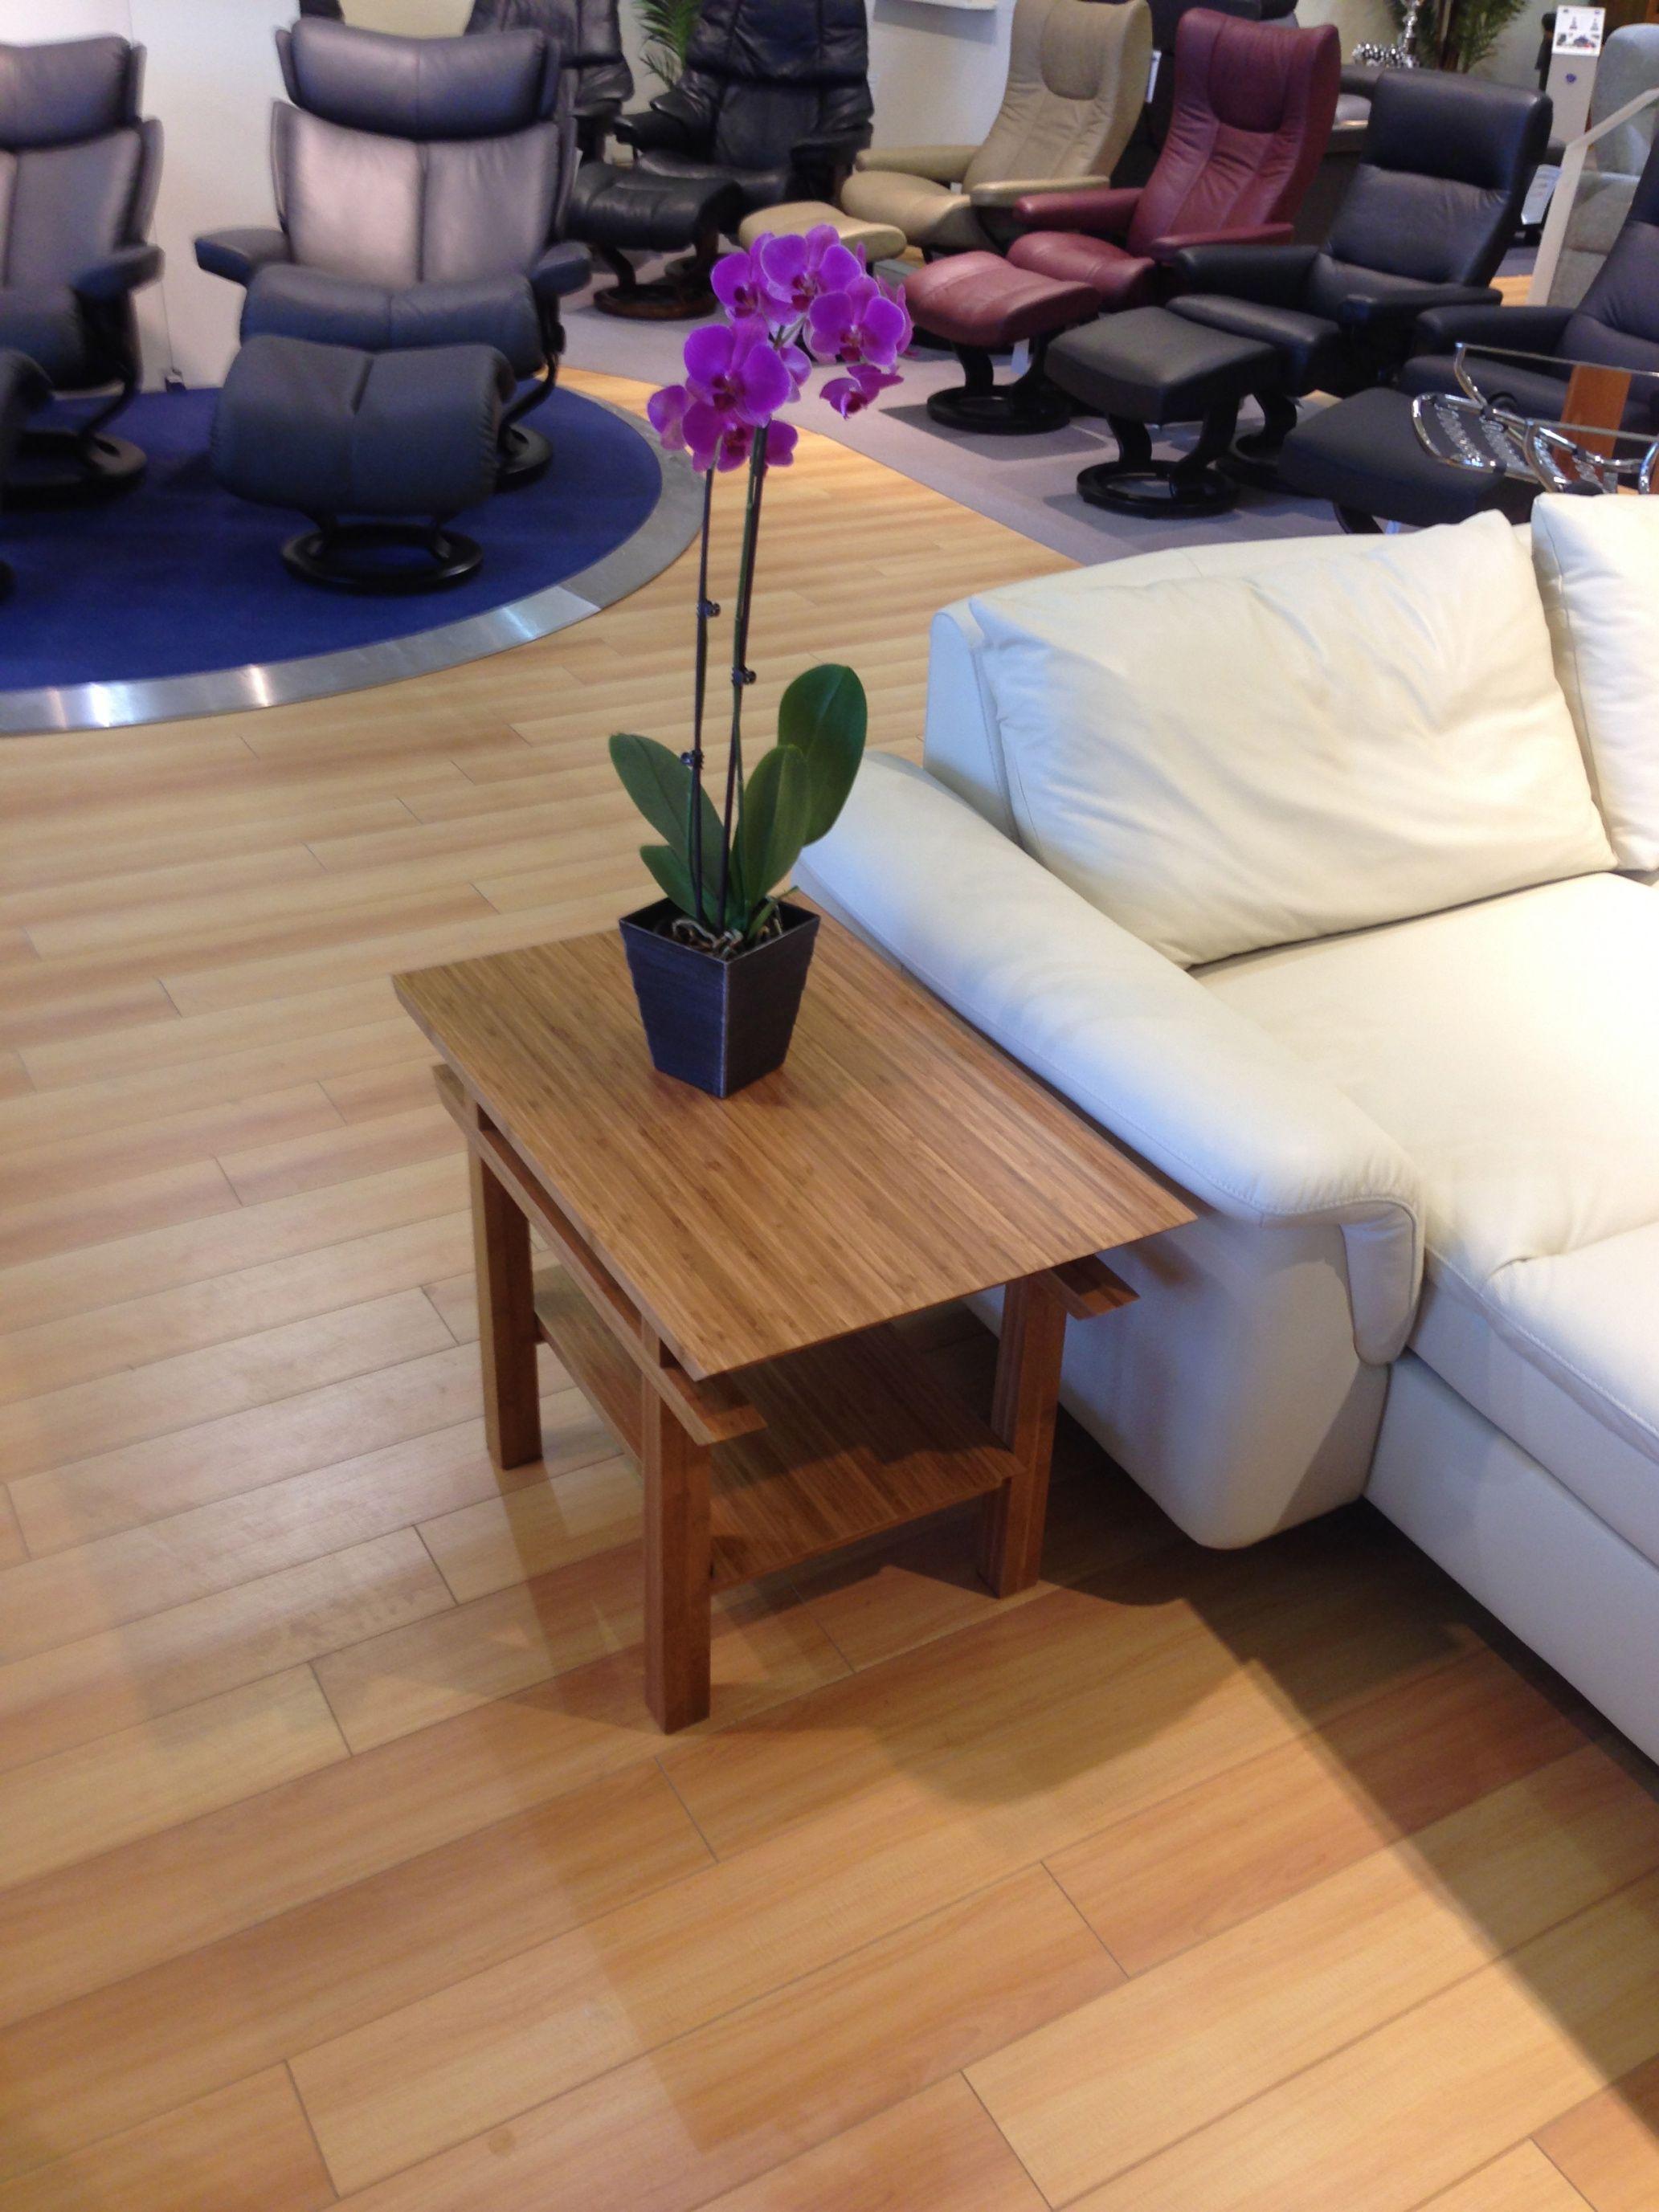 Bon Greenington Fine Bamboo Furniture   Cool Modern Furniture Check More At  Http://cacophonouscreations.com/greenington Fine Bamboo Furniture/